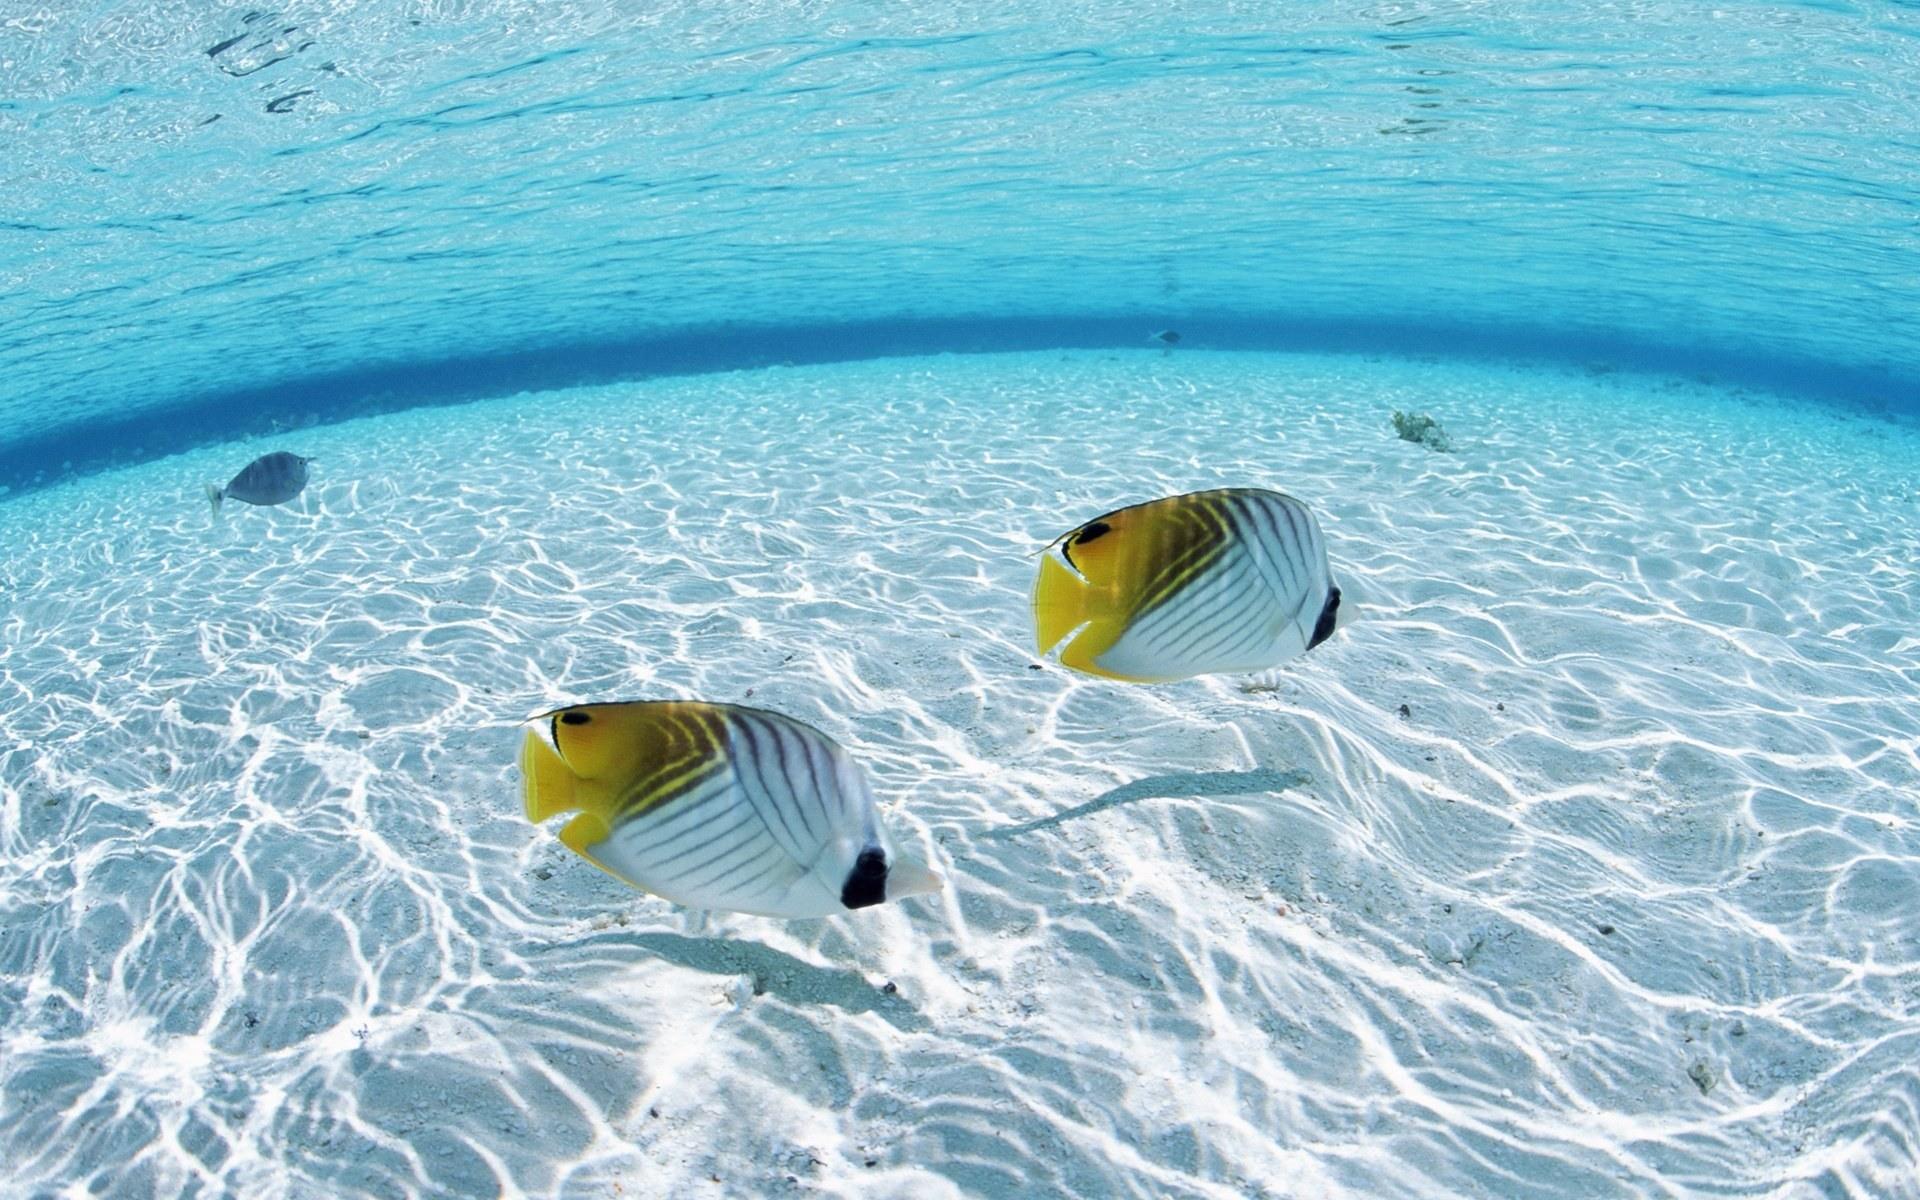 Ocean Animals Wallpaper